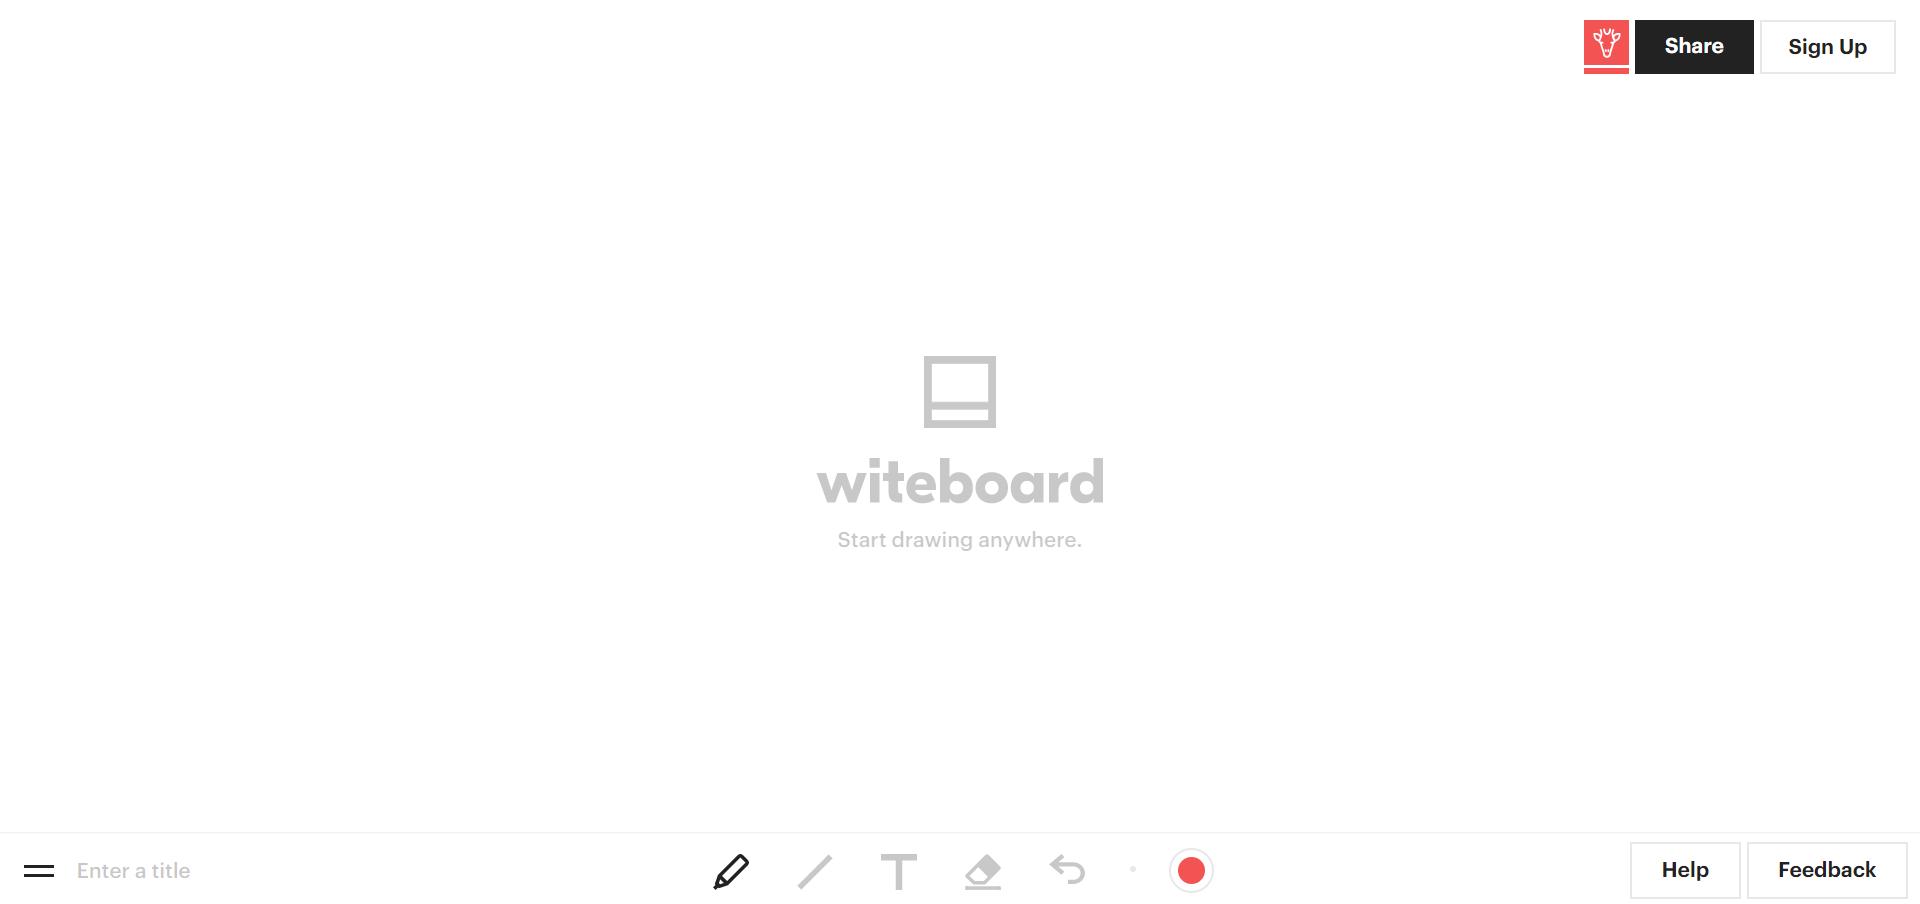 Witeboard main whiteboard